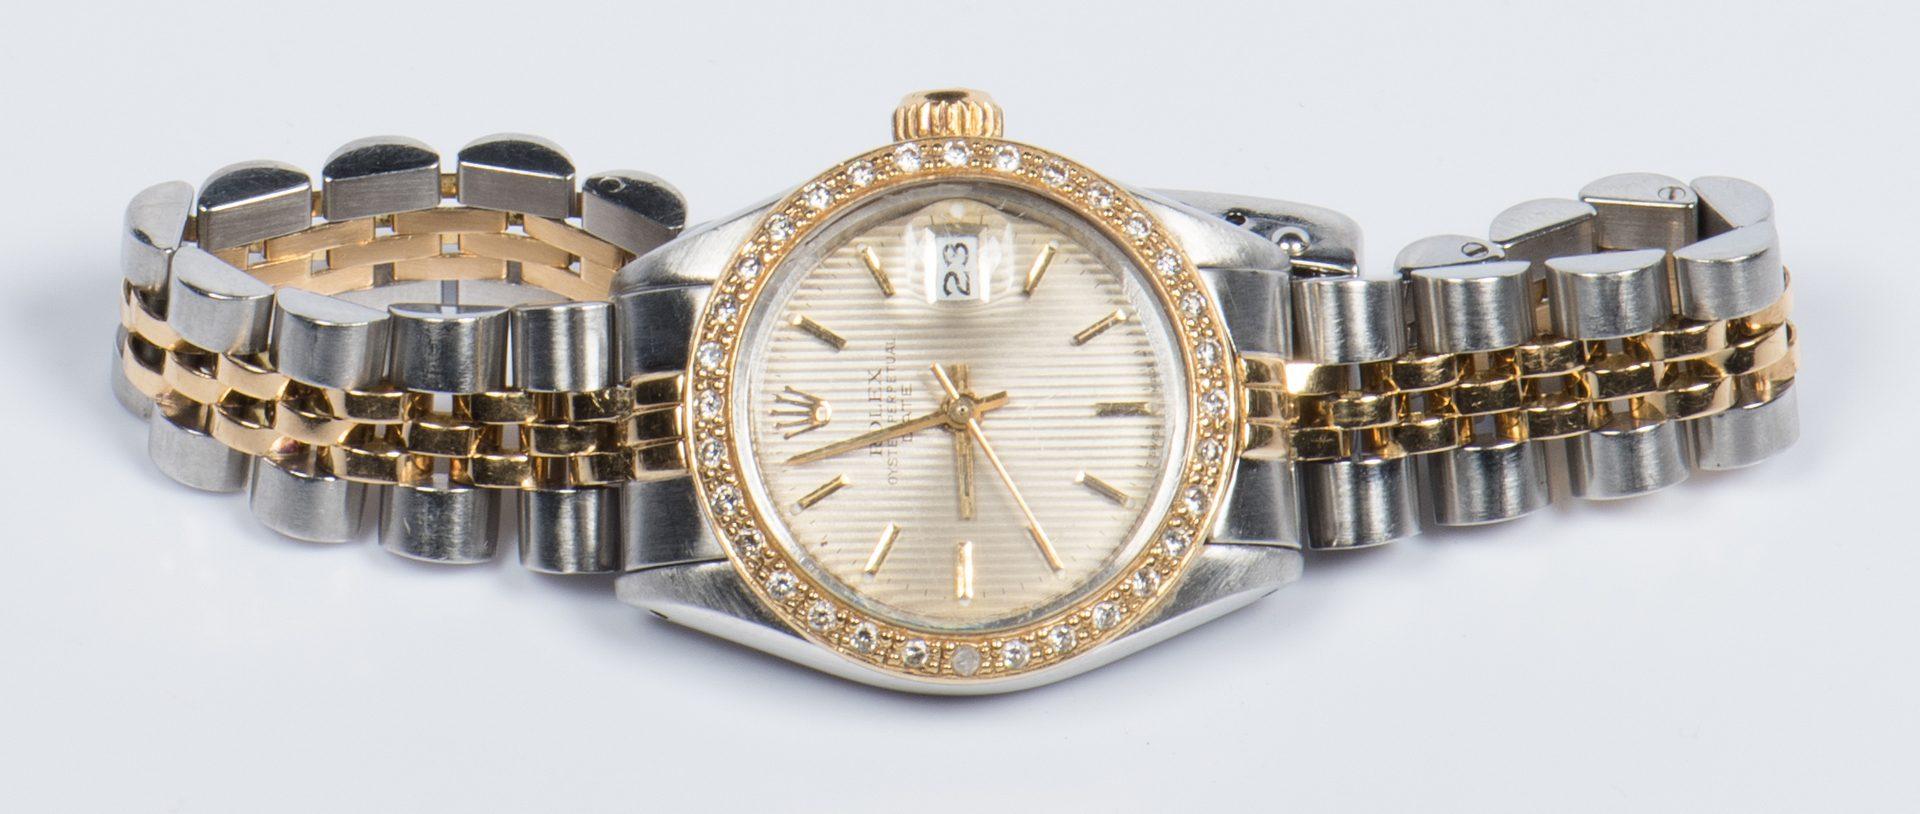 Lot 45: Ladies Rolex w/ Diamond Bezel